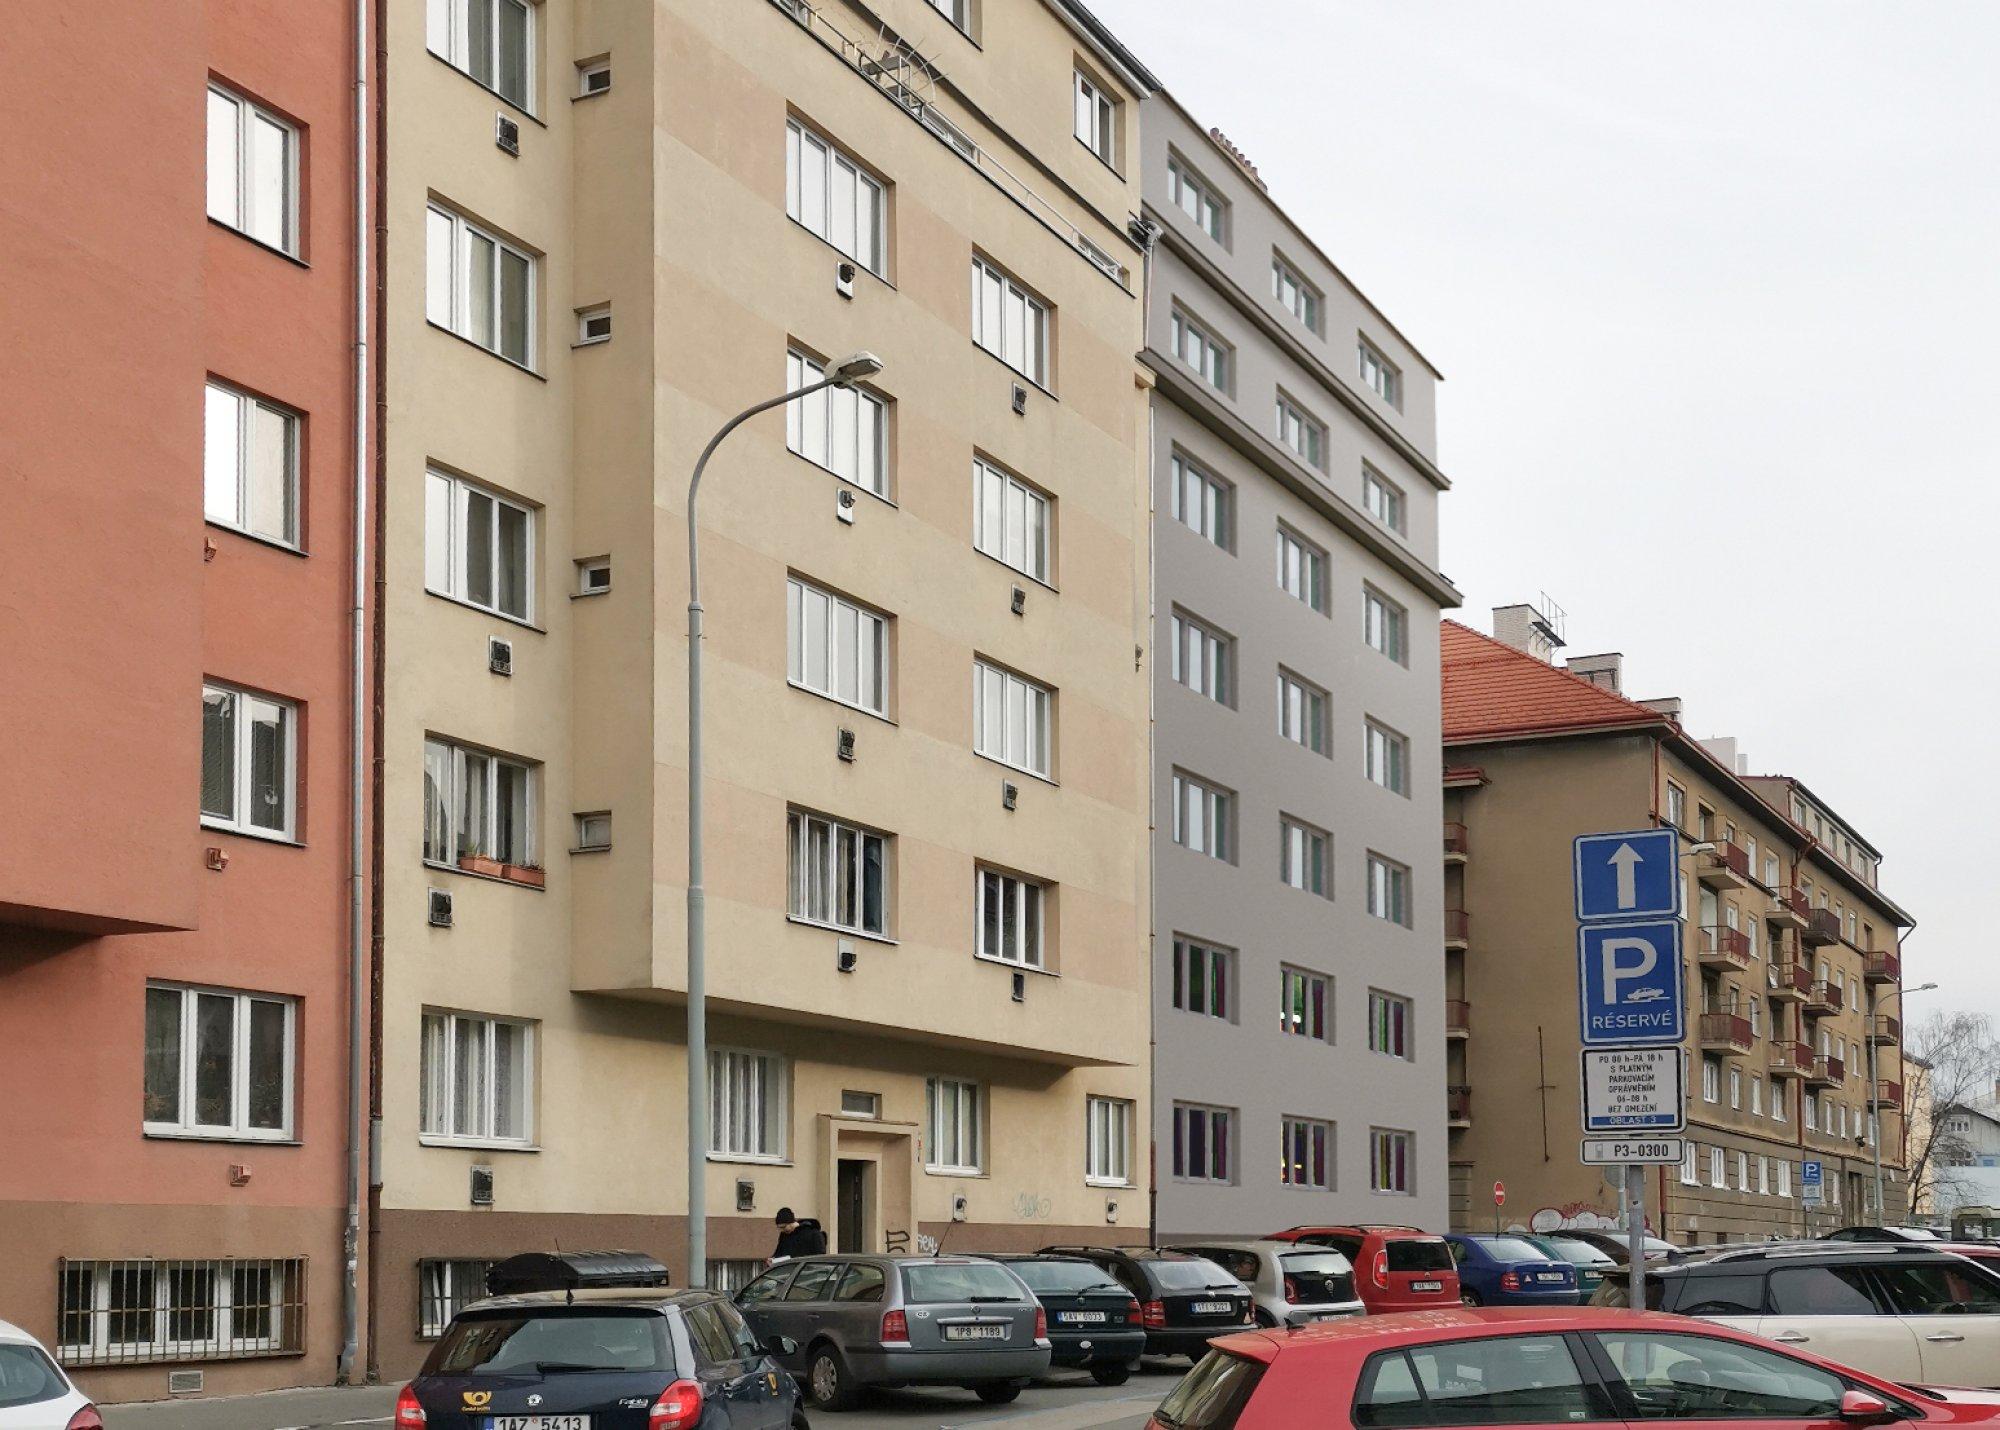 Vizualizace z ulice Jeseniova - developerský projekt Viklefova, ulice Viklefova, Praha 8 - Žižkov | 2